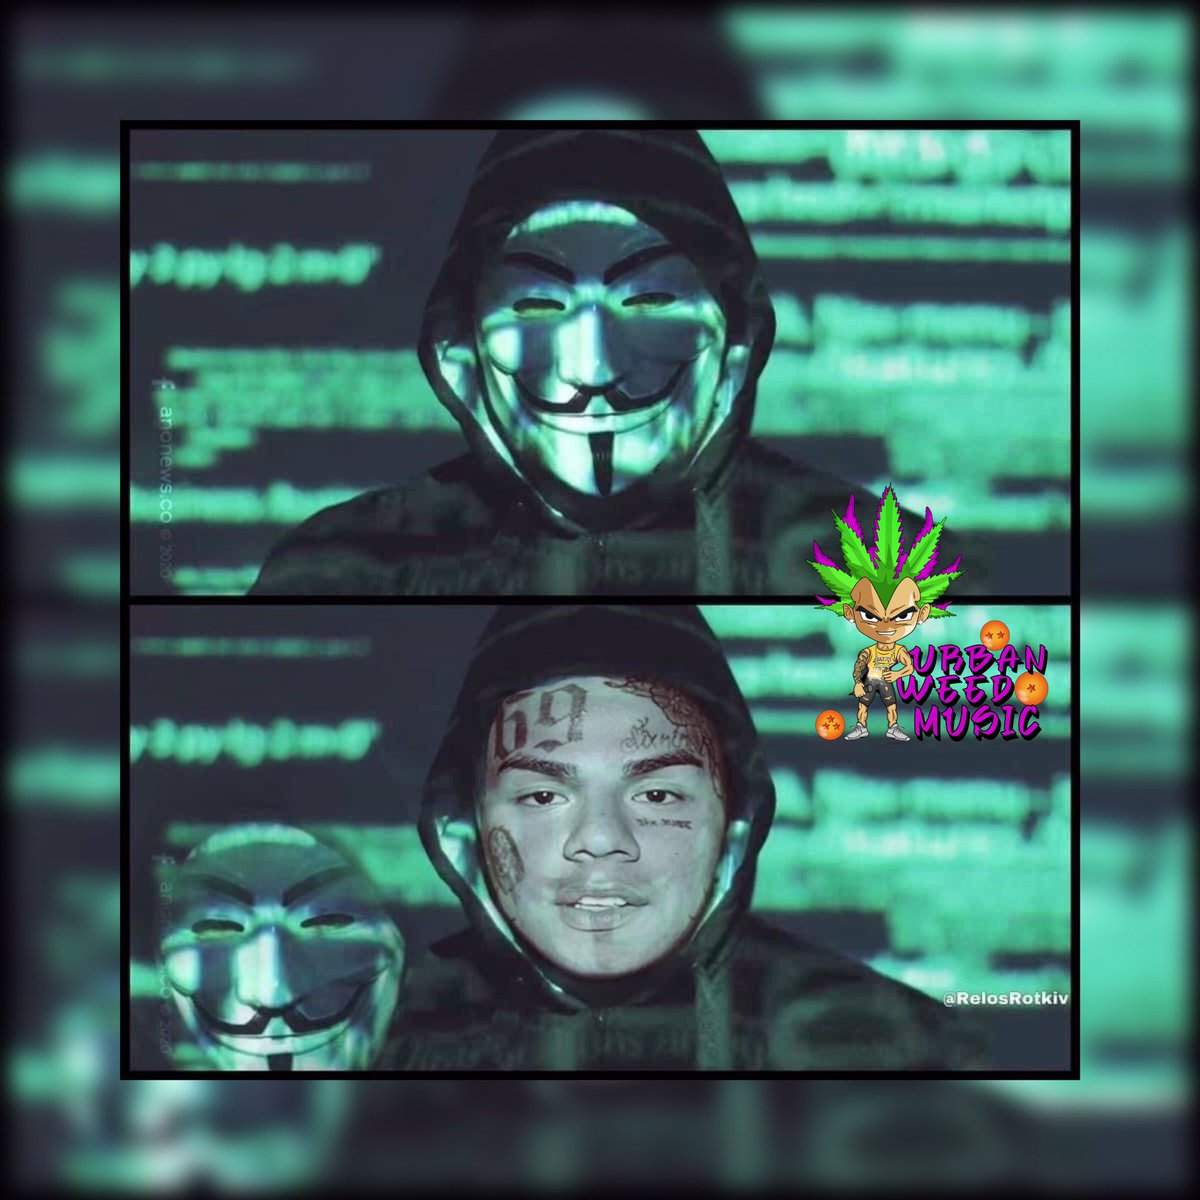 #Tekashi69 es el verdadero #Anonymous 😨 @ash_weedpr IG https://t.co/wn20fvEvSm